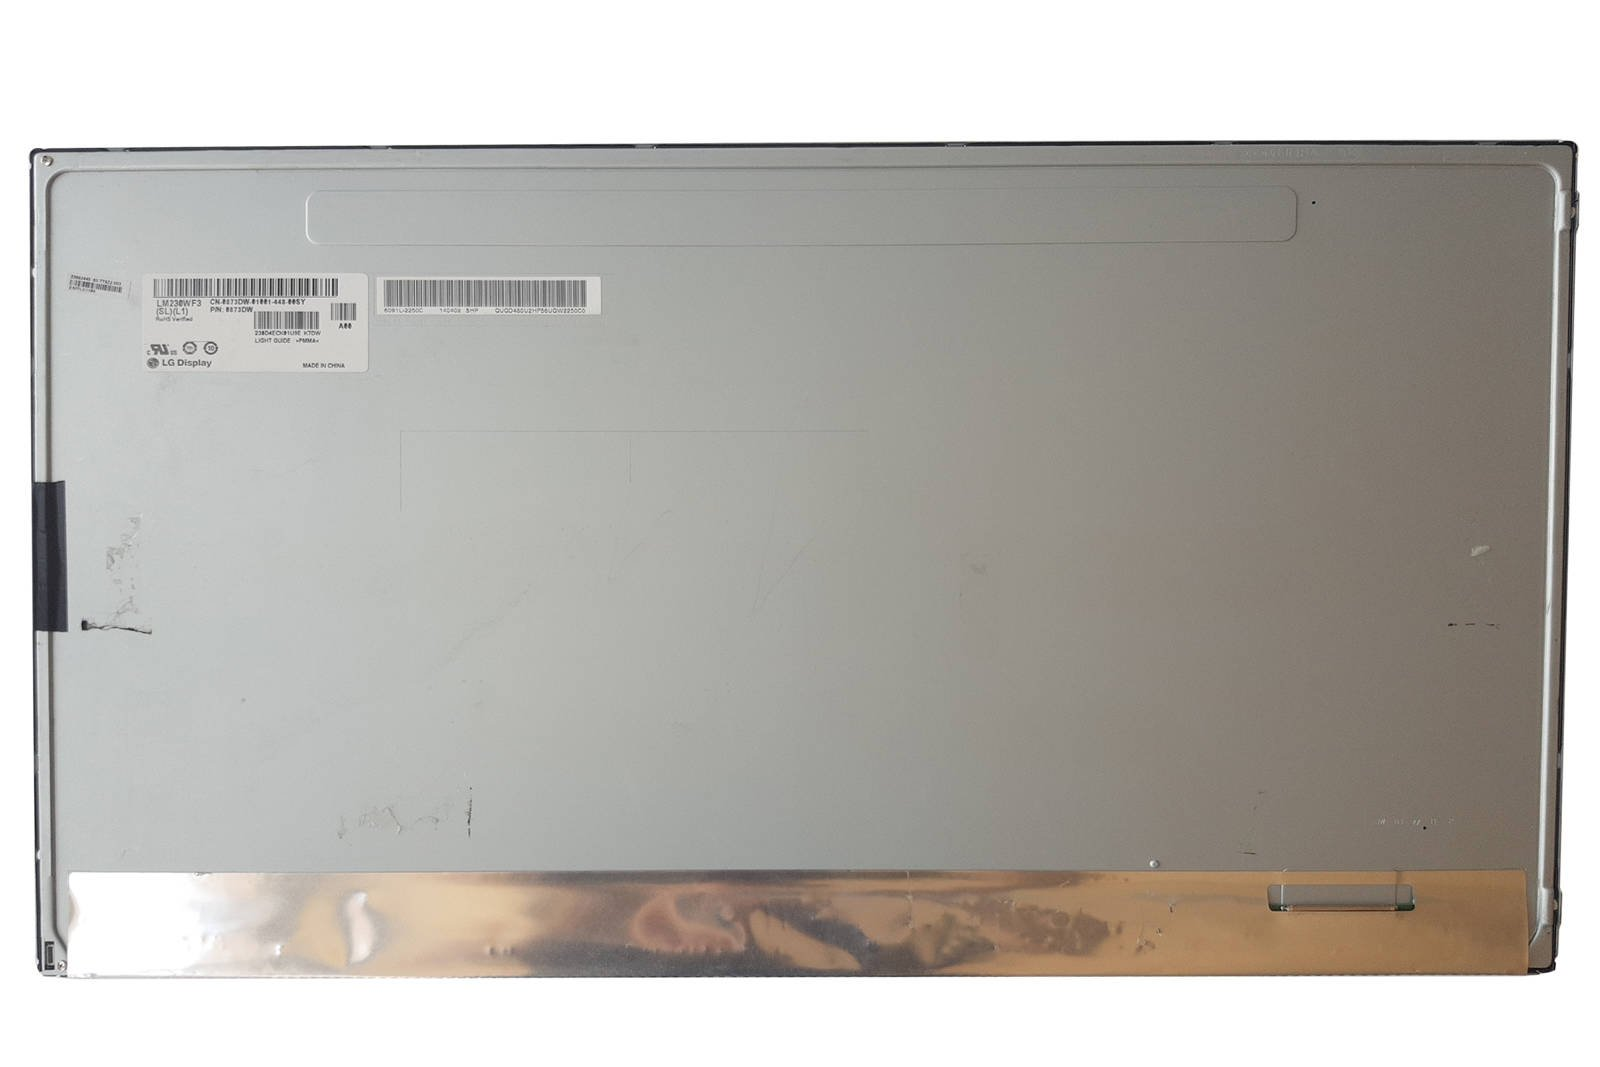 Bildschirm LG DIsplay 23' LM230WF3-SLL1